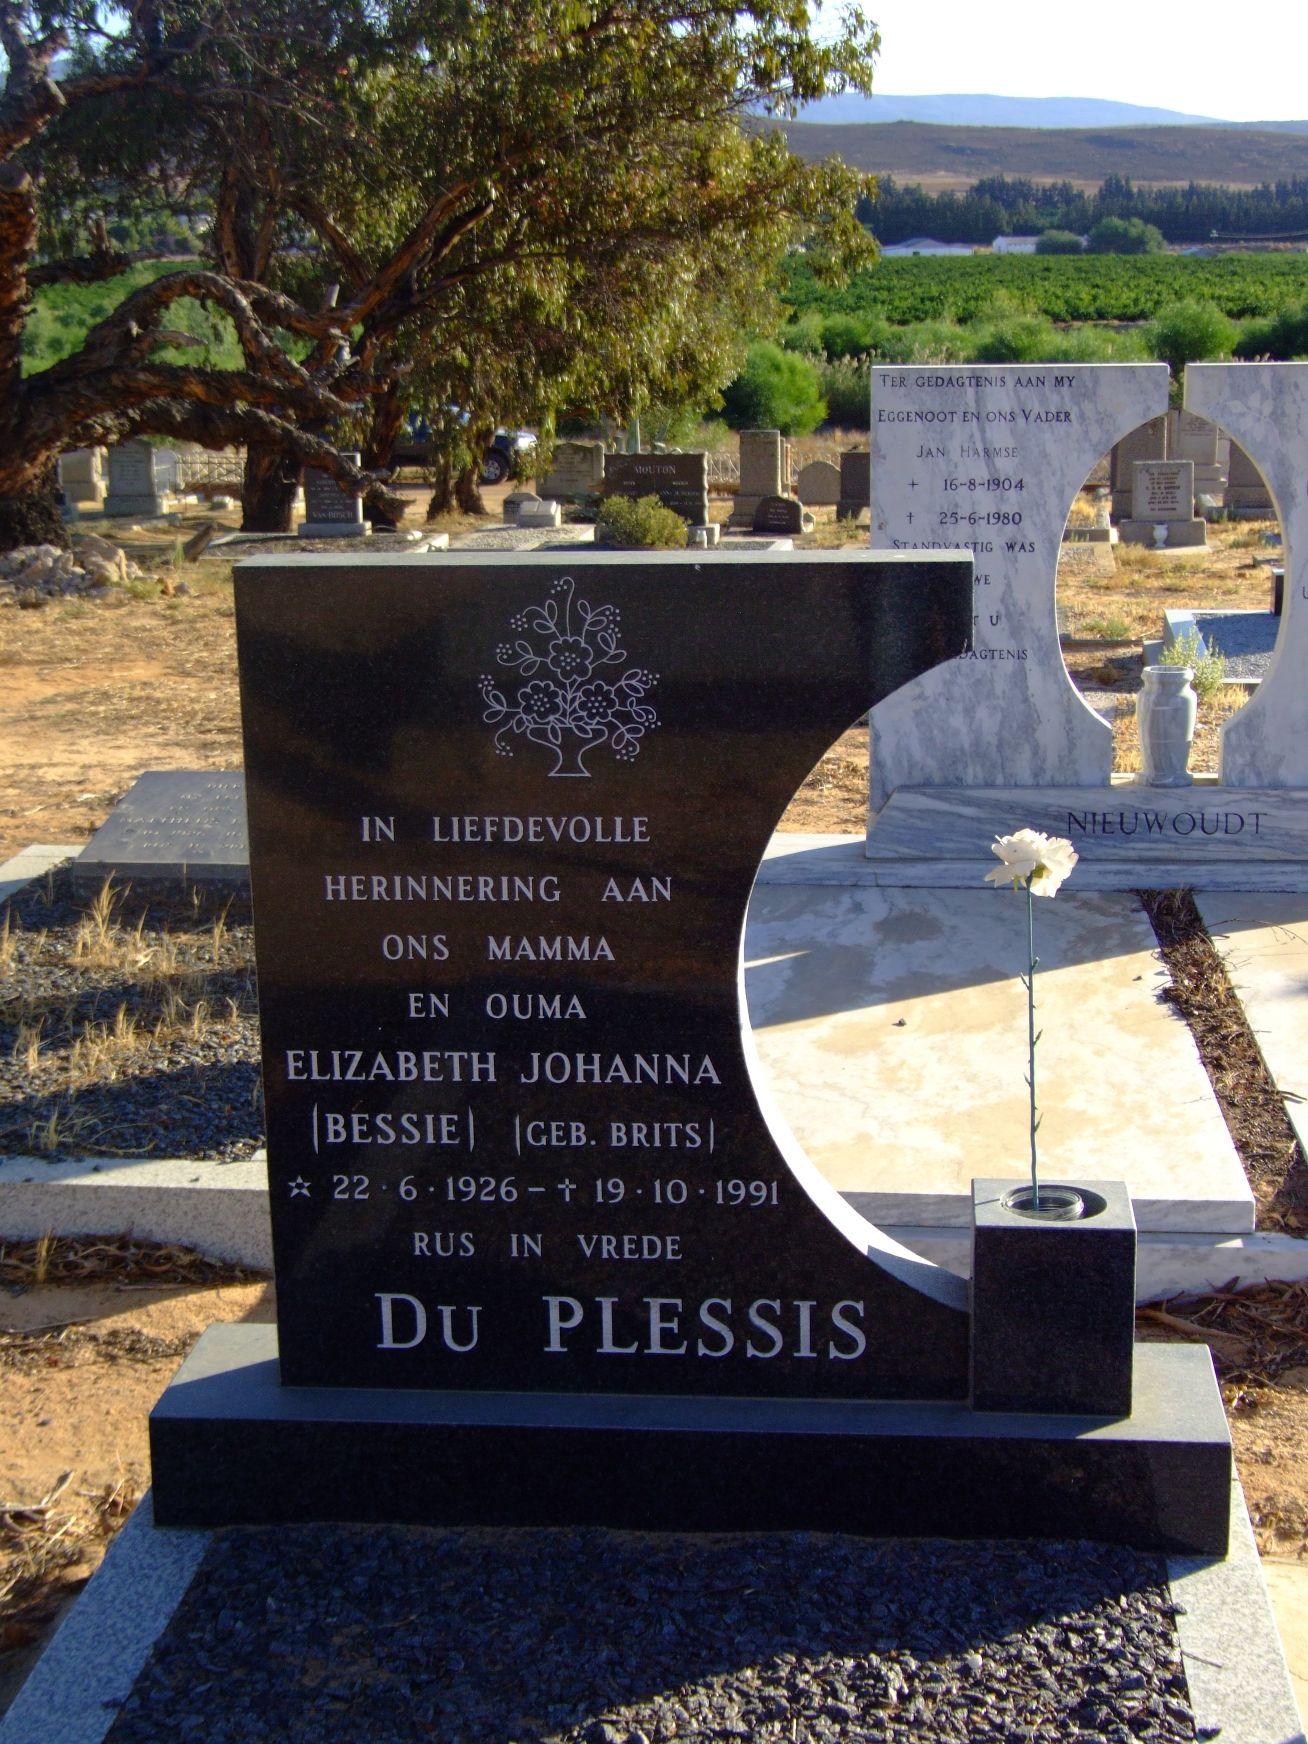 Du Plessis, Elizabeth Johanna (nee Brits)